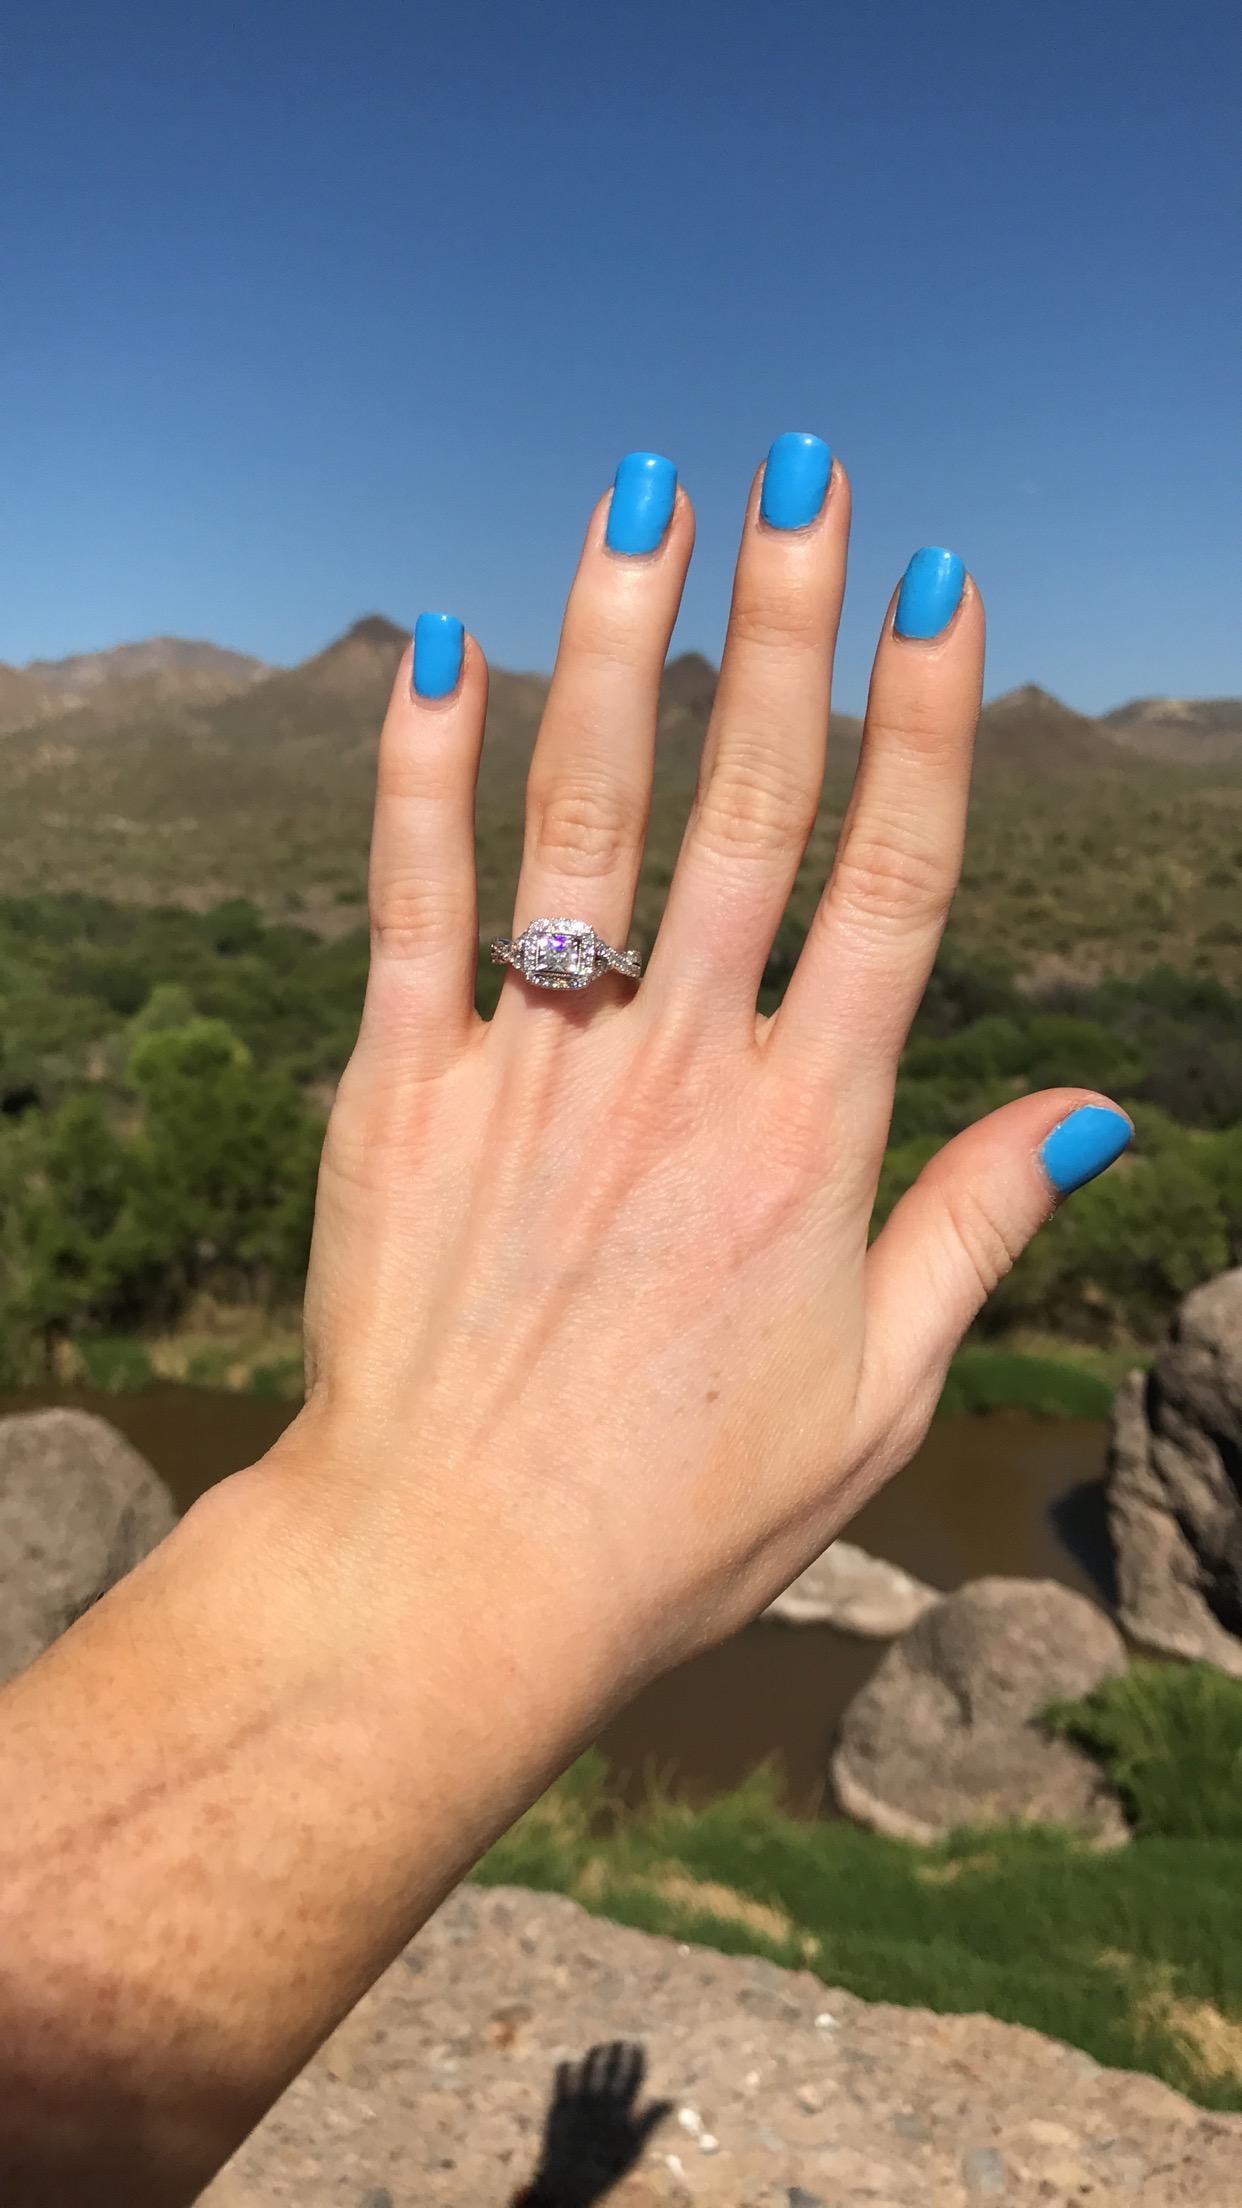 Engagement Proposal Ideas in Rio Verde, Arizona